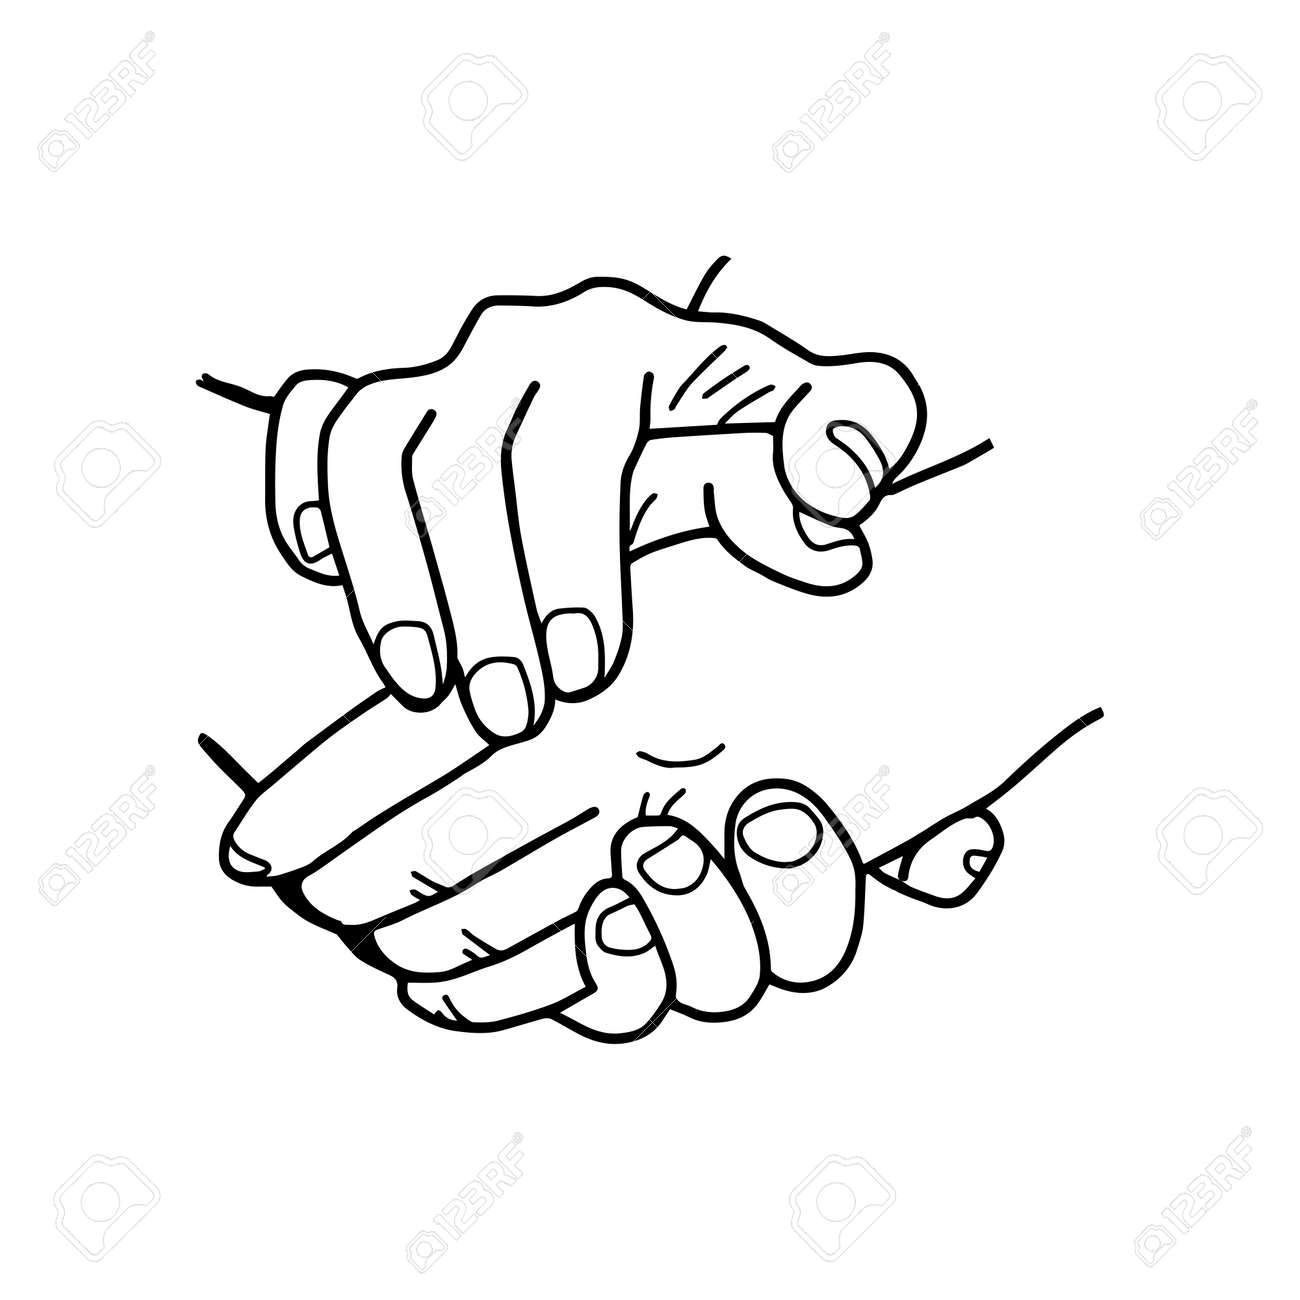 Partneship. hand drawn handshake vector illustration - 69022140